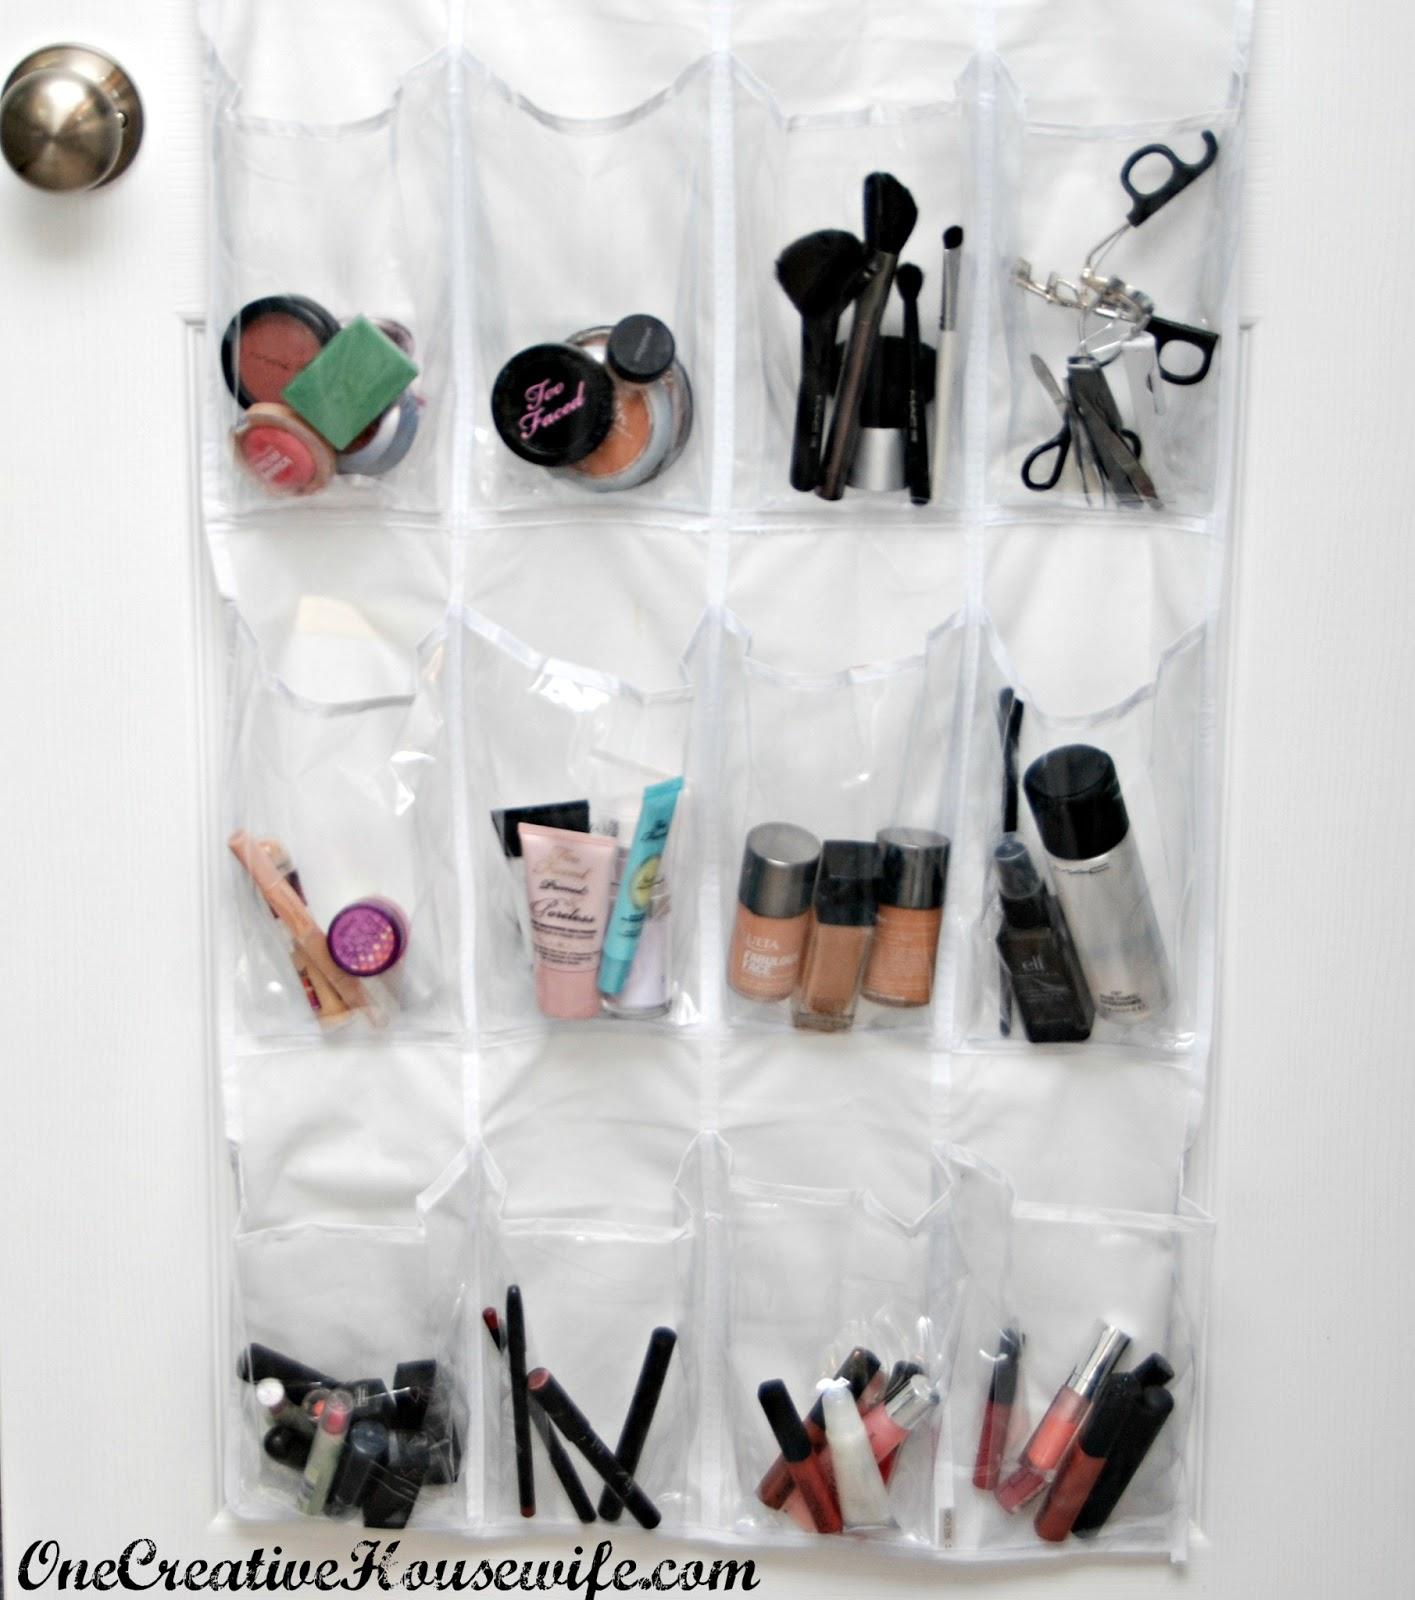 Shoe Organizer | Makeup Organizers And Storage Ideas For Makeup Junkies